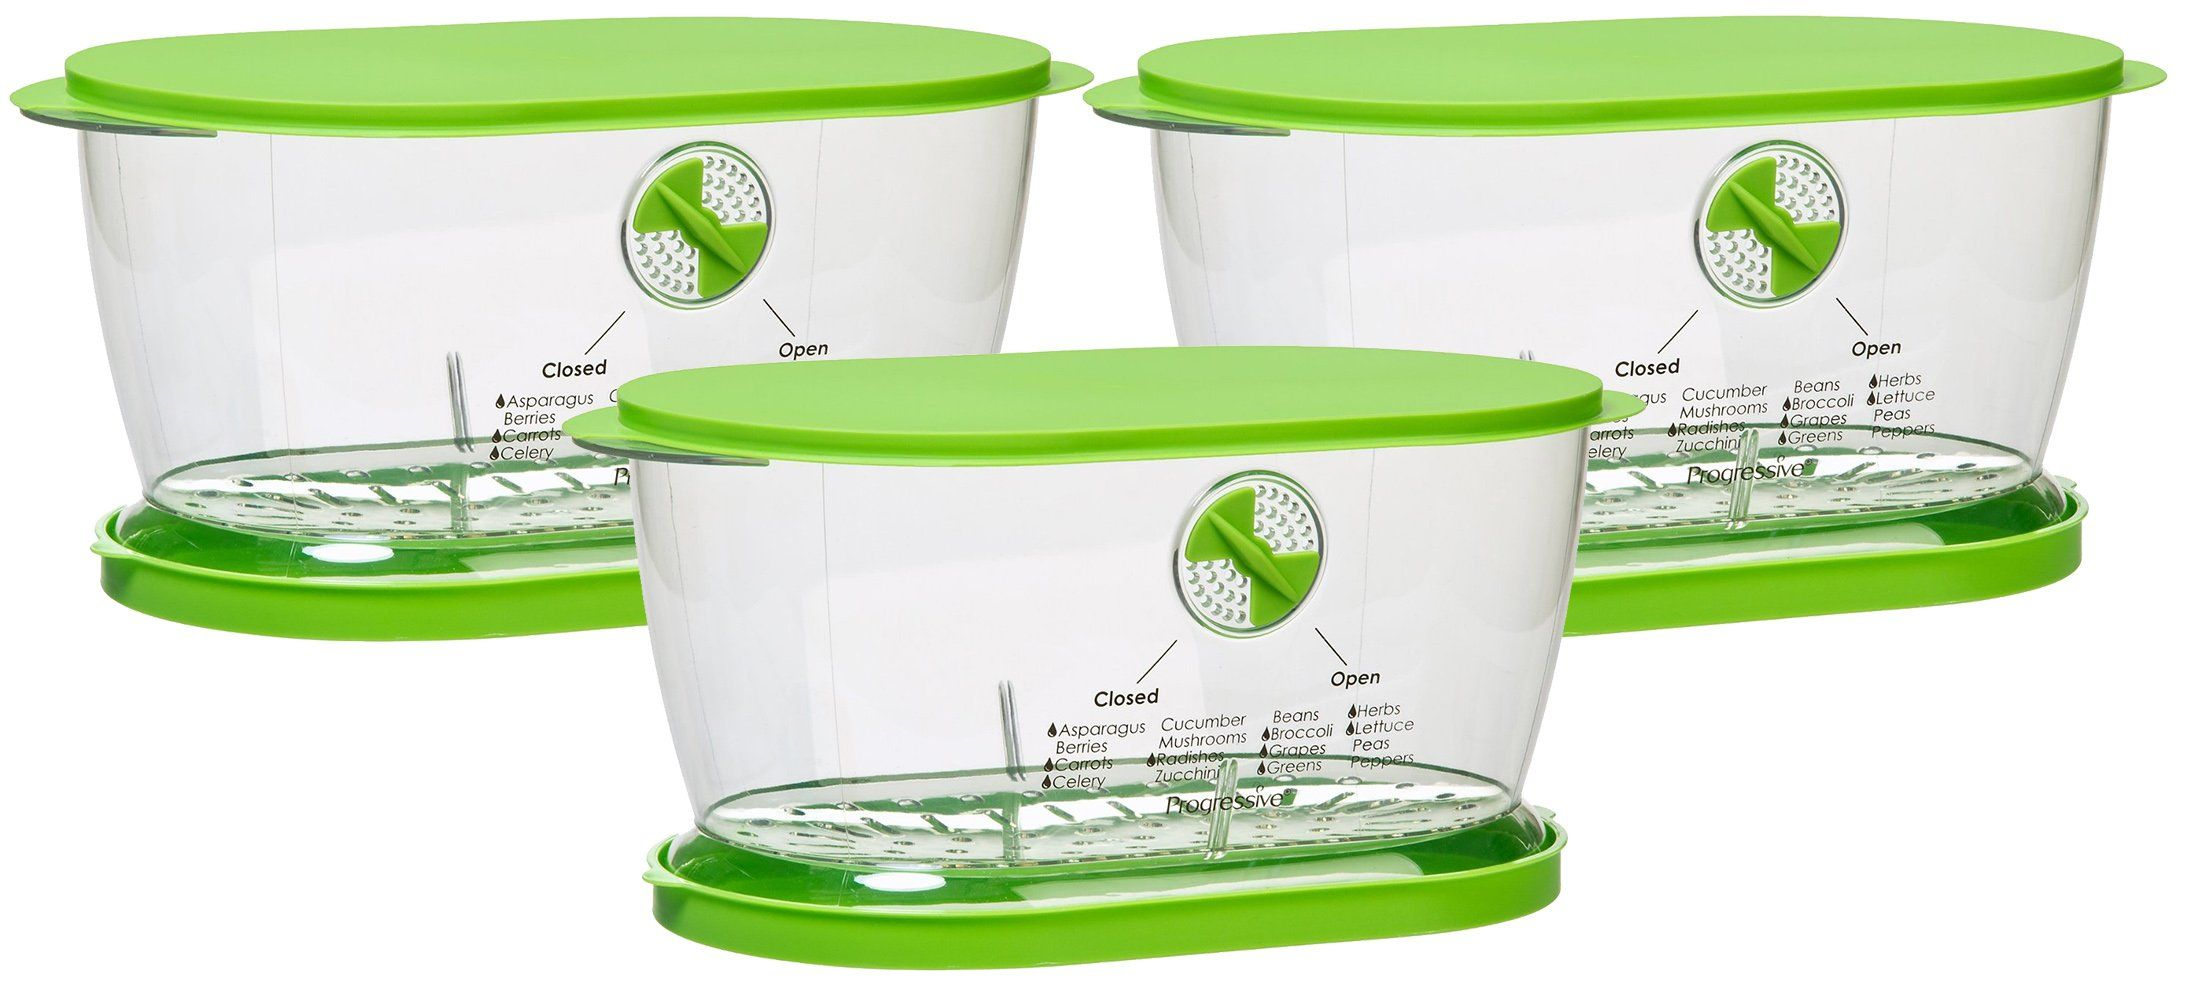 Prepworks from Progressive LKS-06 Lettuce Keeper(3 Pack)